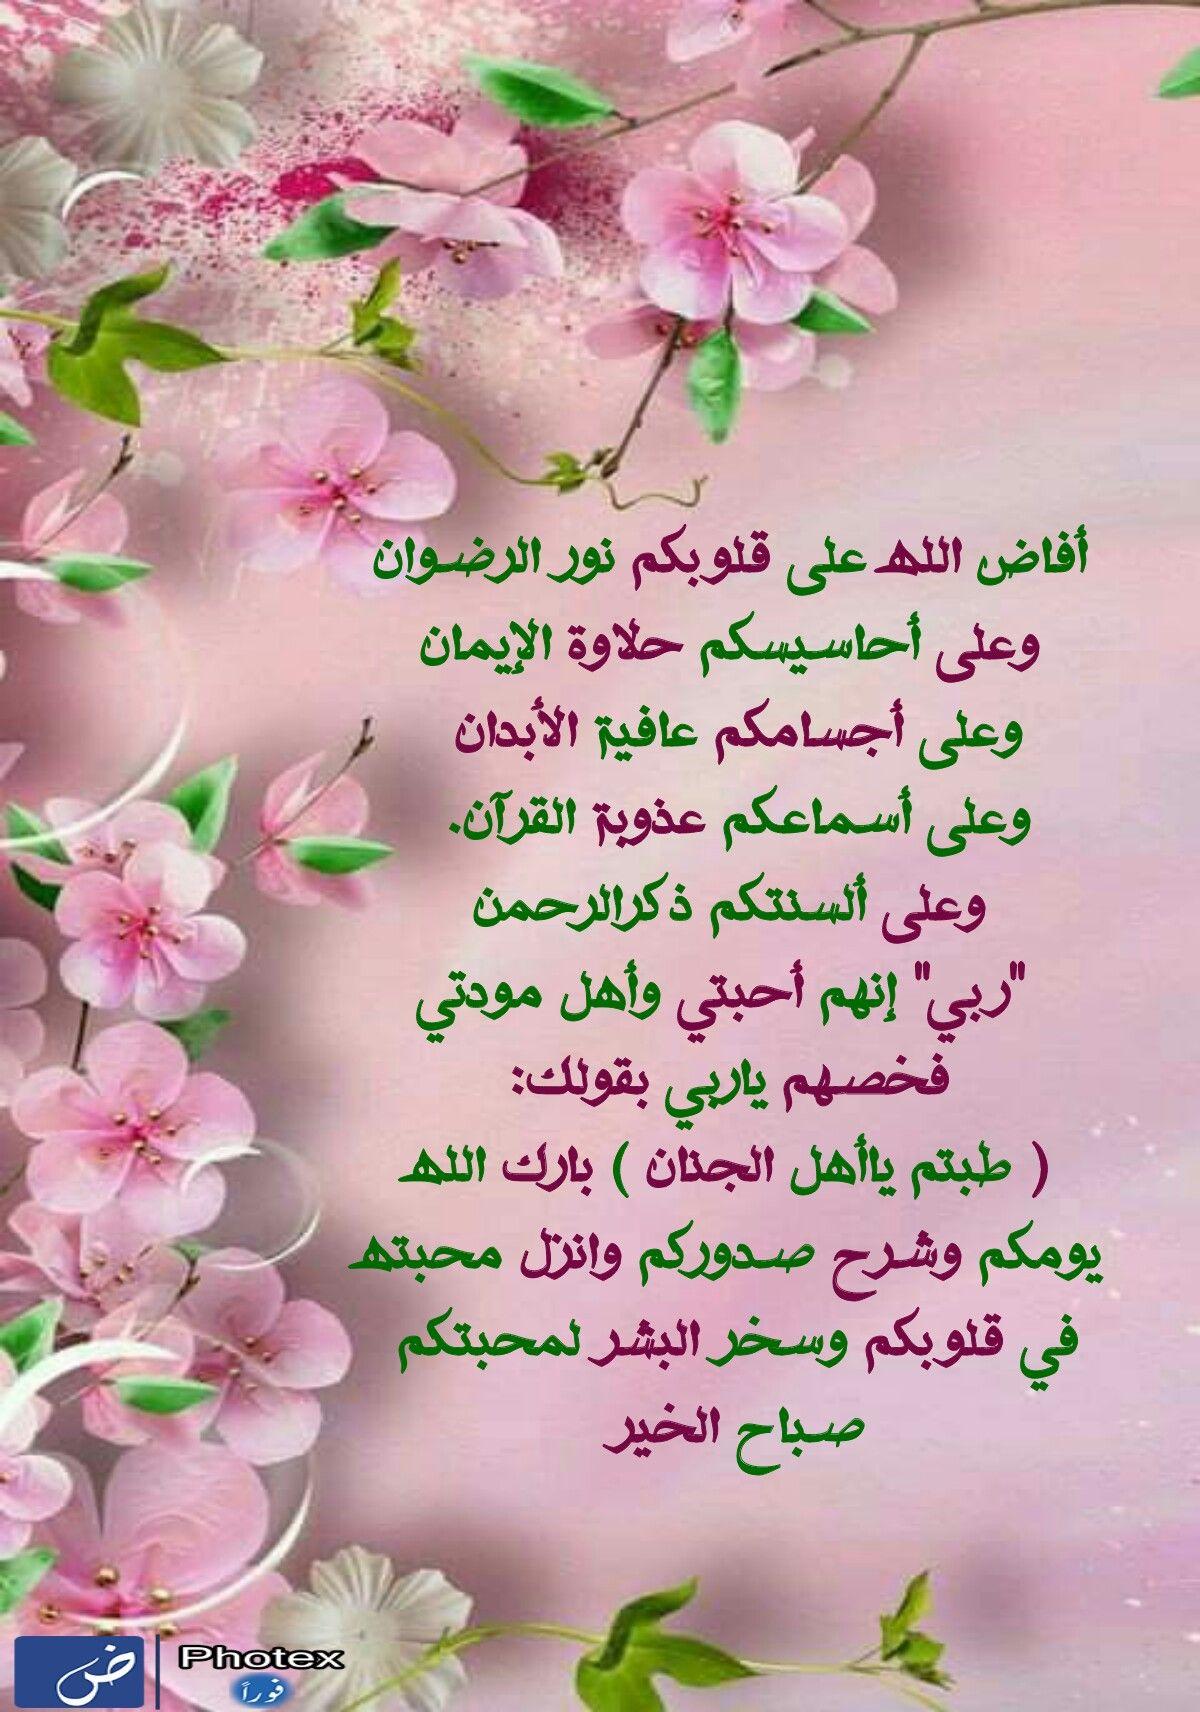 صباح الخيرات Morning Images Romantic Love Quotes Morning Wish